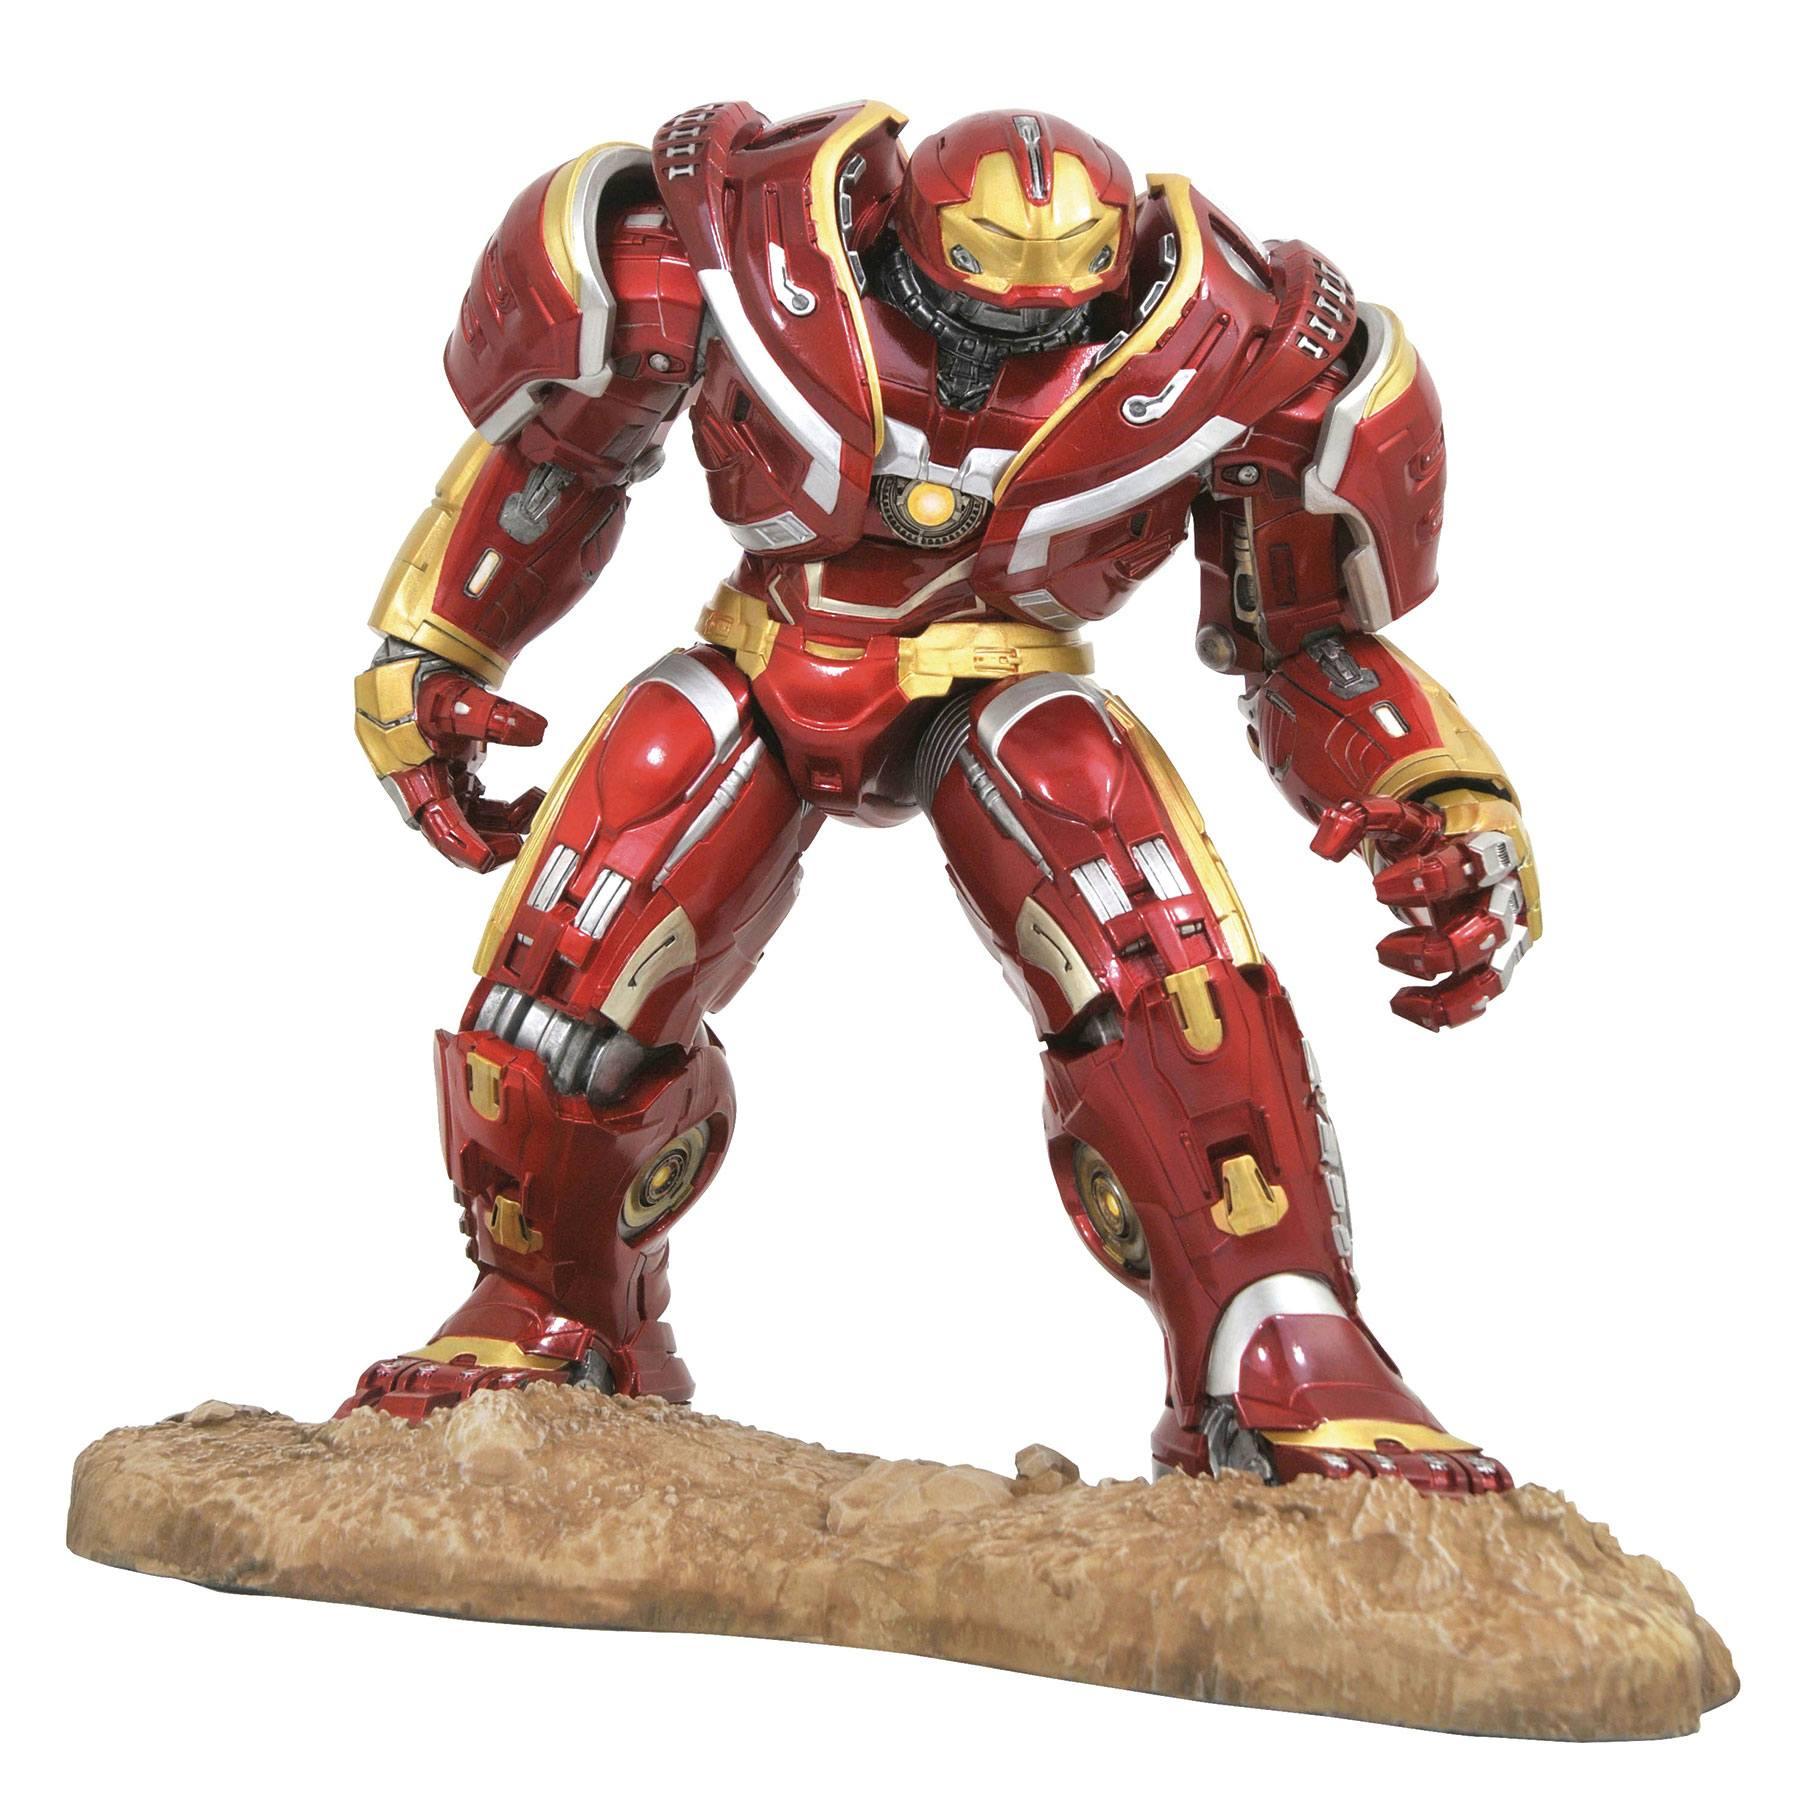 Avengers Infinity War Marvel Movie Milestones Statue MK2 61 cm